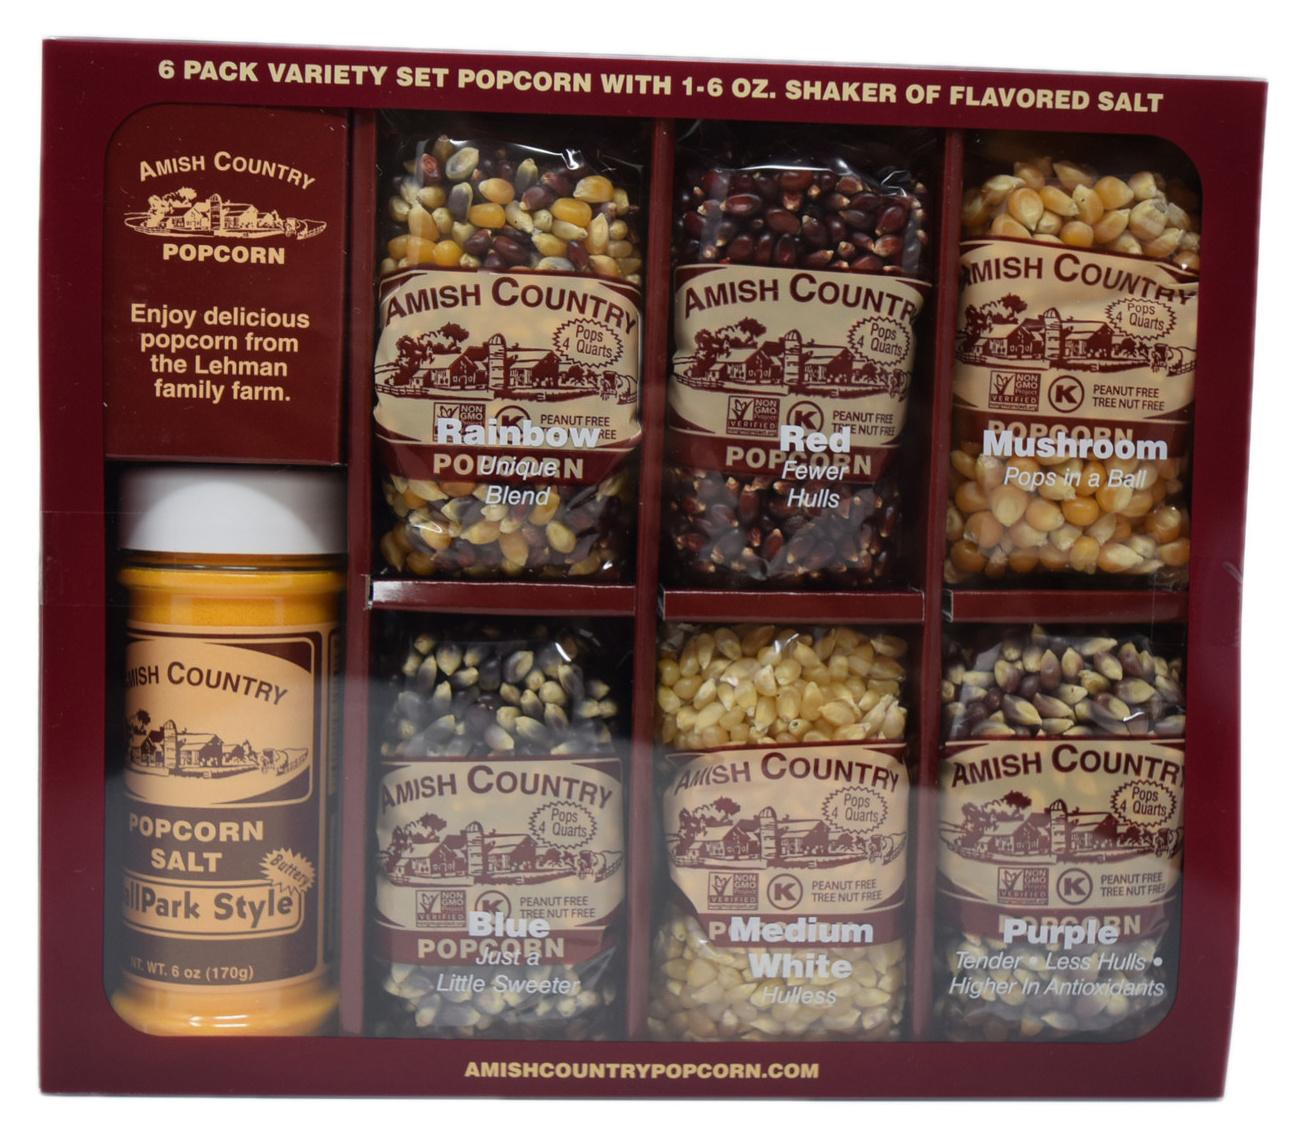 Amish Popcorn 6, 4oz popcorns with salt shaker-1